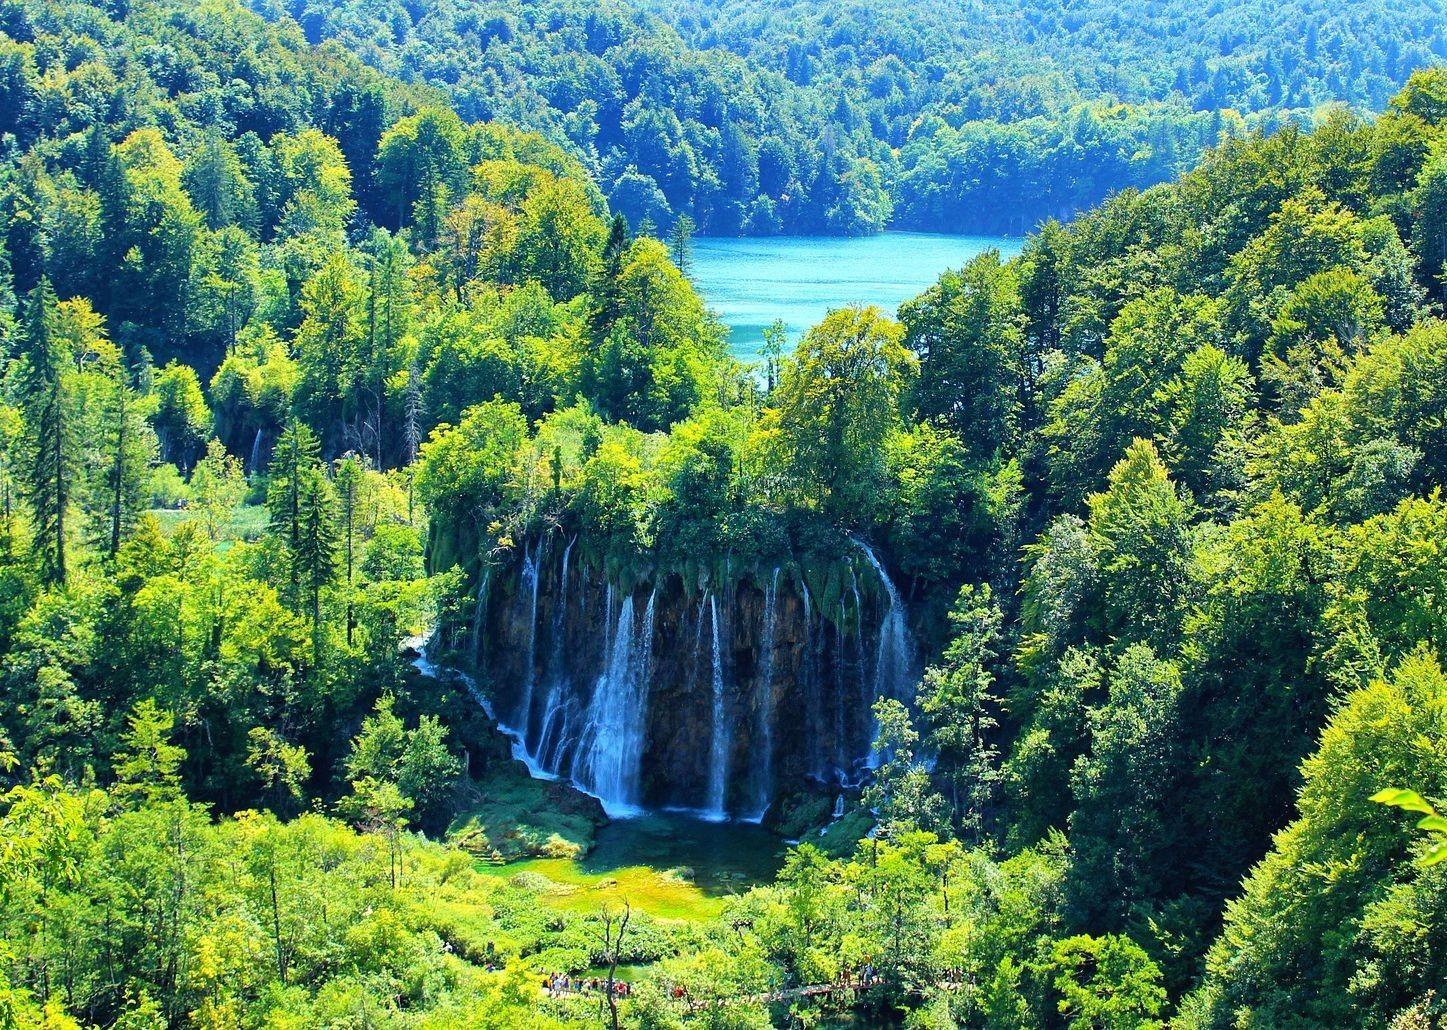 waterfalls-of-krka-canyon-croatia-bike-tour.jpg - Croatia - Dalmatian National Parks and Islands Plus - Bike and Boat Holiday - Leisure Cycling